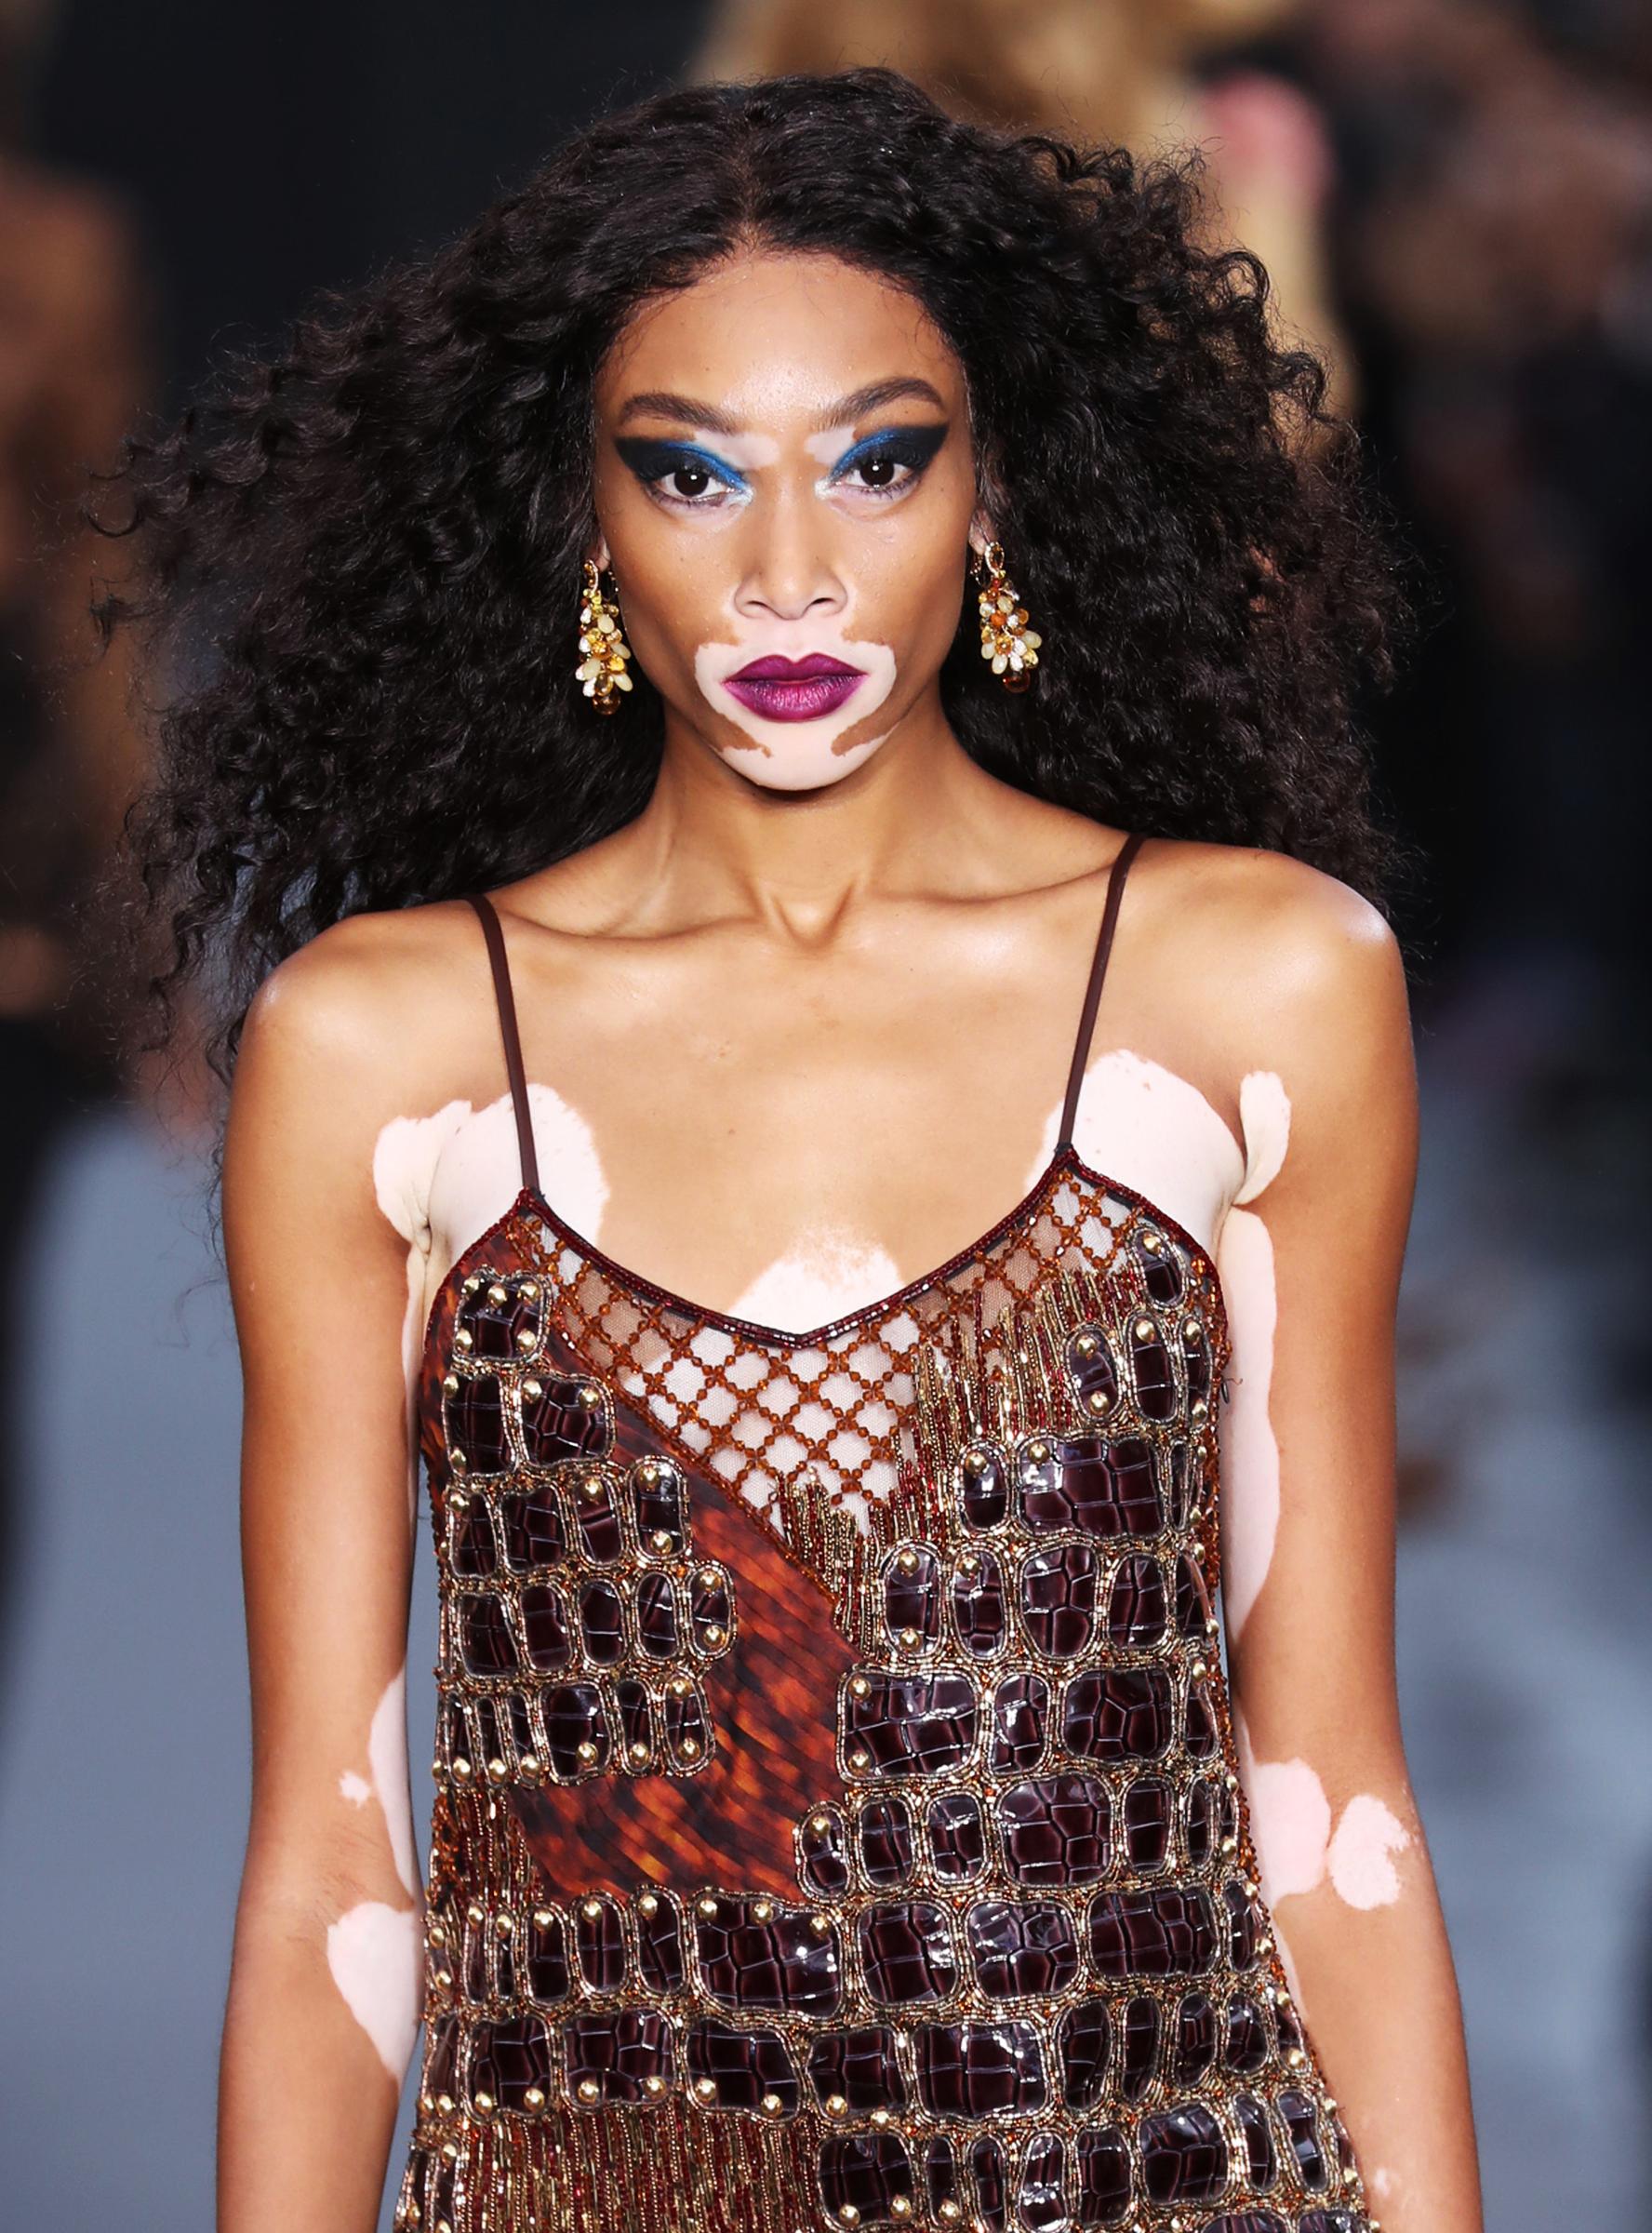 mariposa progresivo Joya  Why These Dolls With Vitiligo Are Such A Big Deal+#refinery29 | Winnie  harlow, La fashion week, Famous models